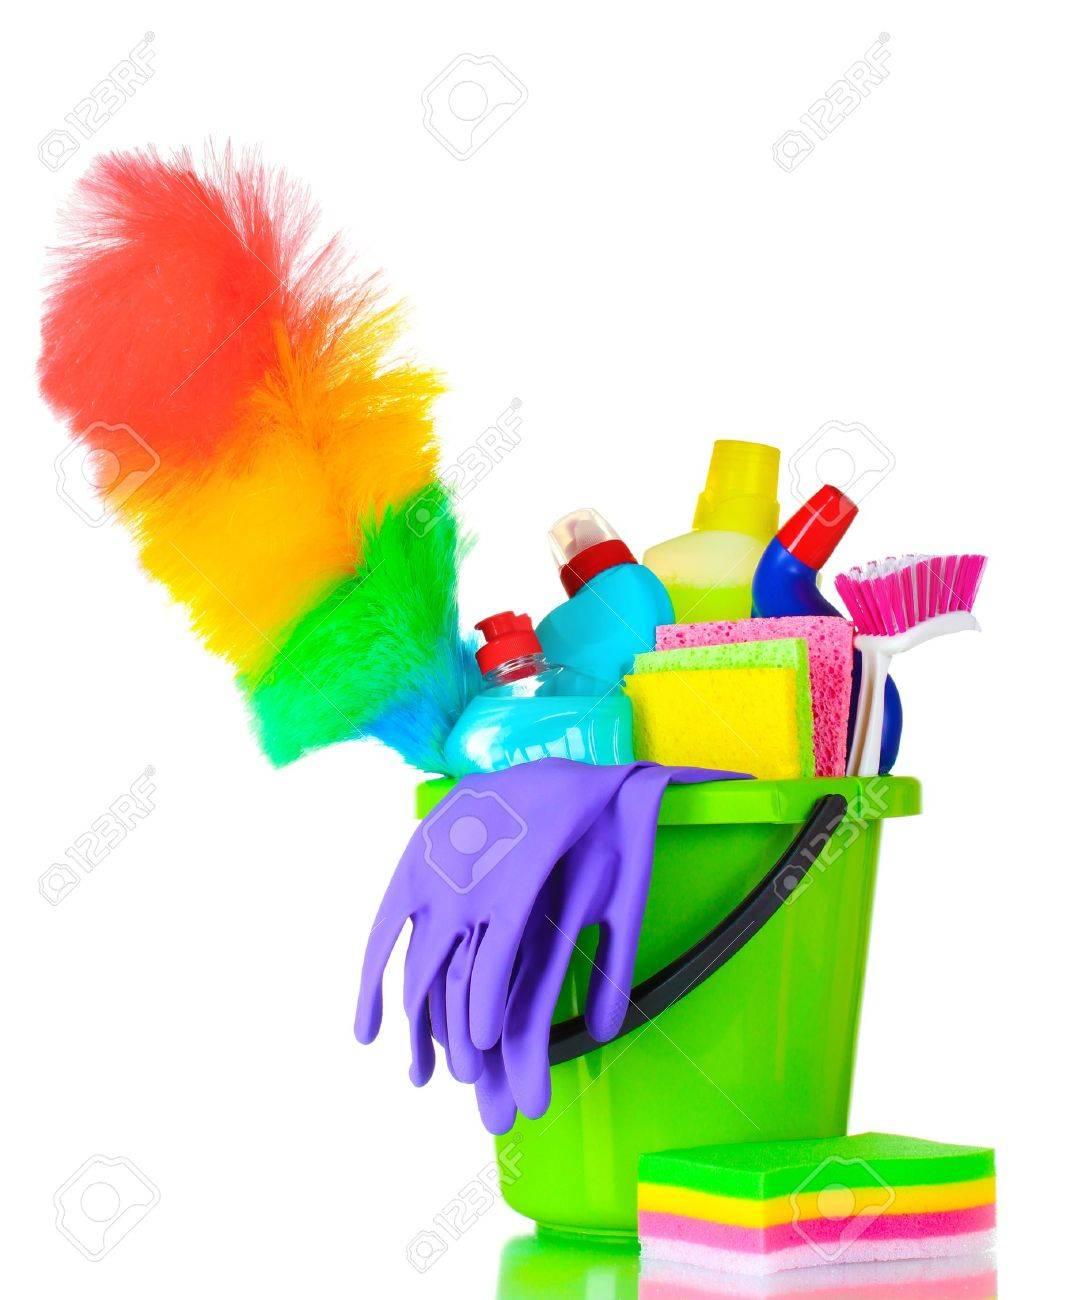 detergent bottles, brush, gloves and sponges in bucket isolated on white Stock Photo - 10394939